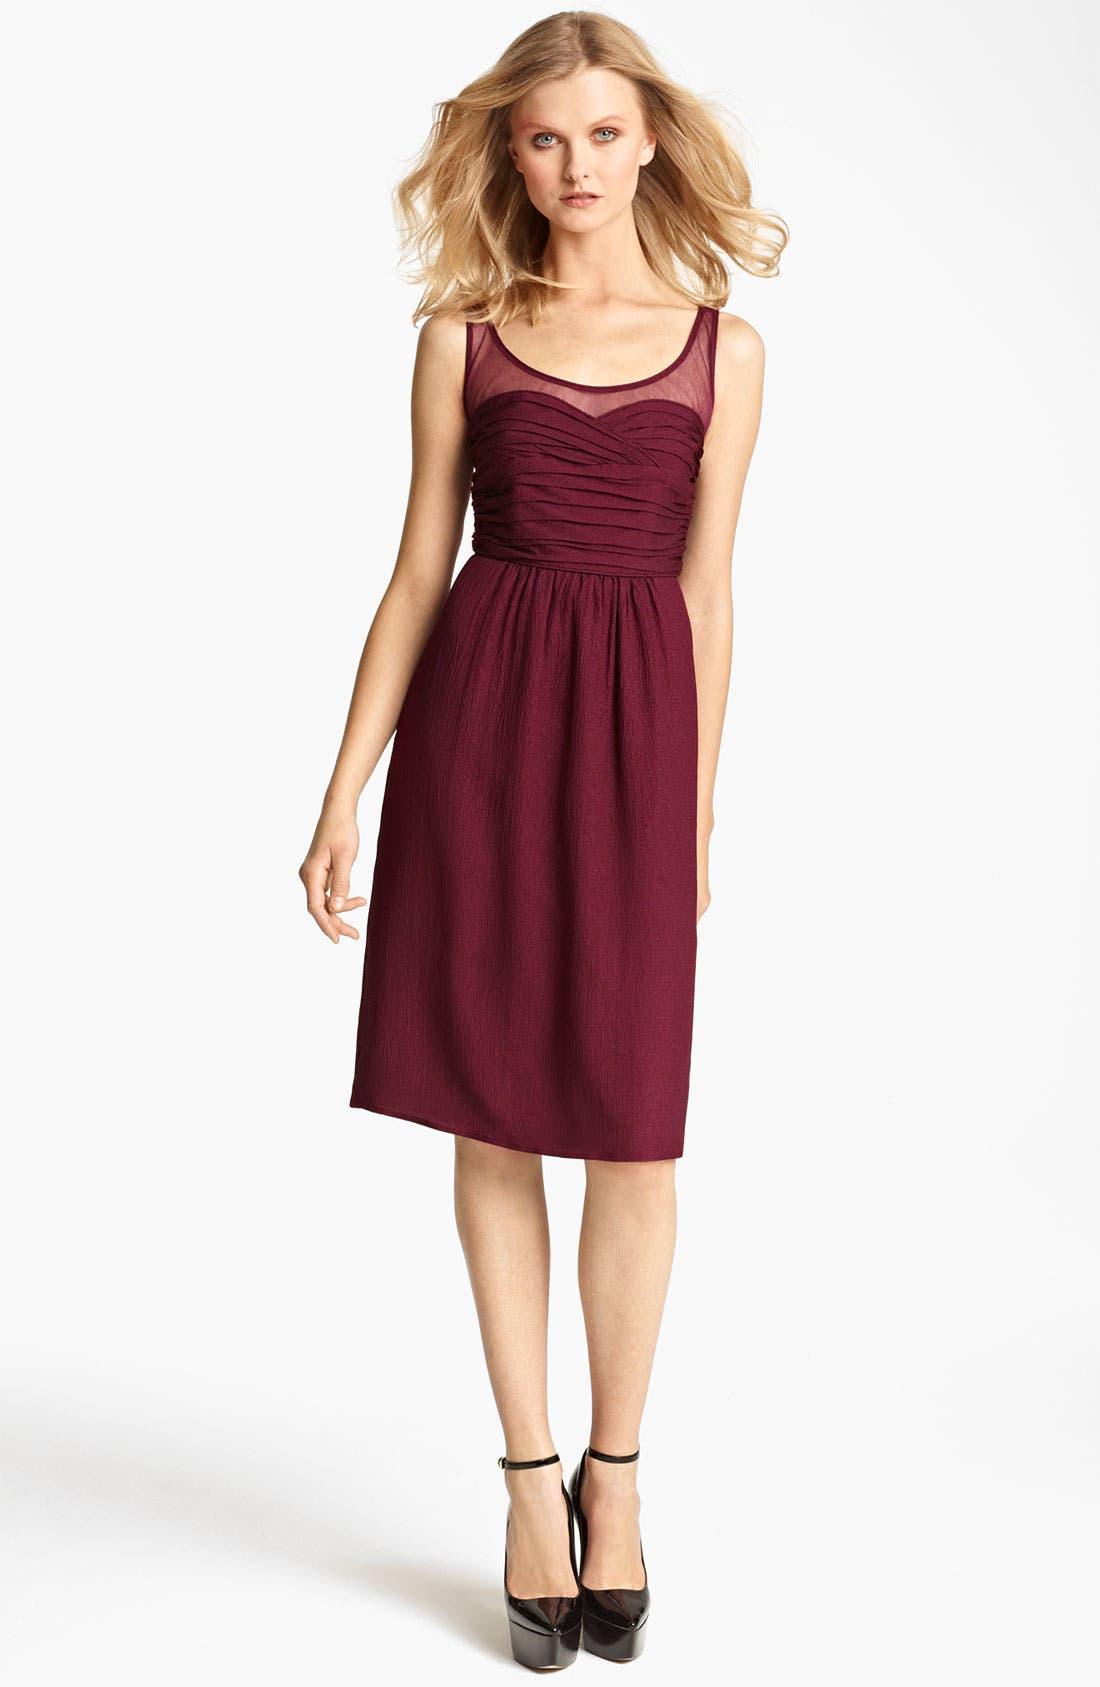 Main Image - Burberry London Sleeveless Crinkle Chiffon Dress